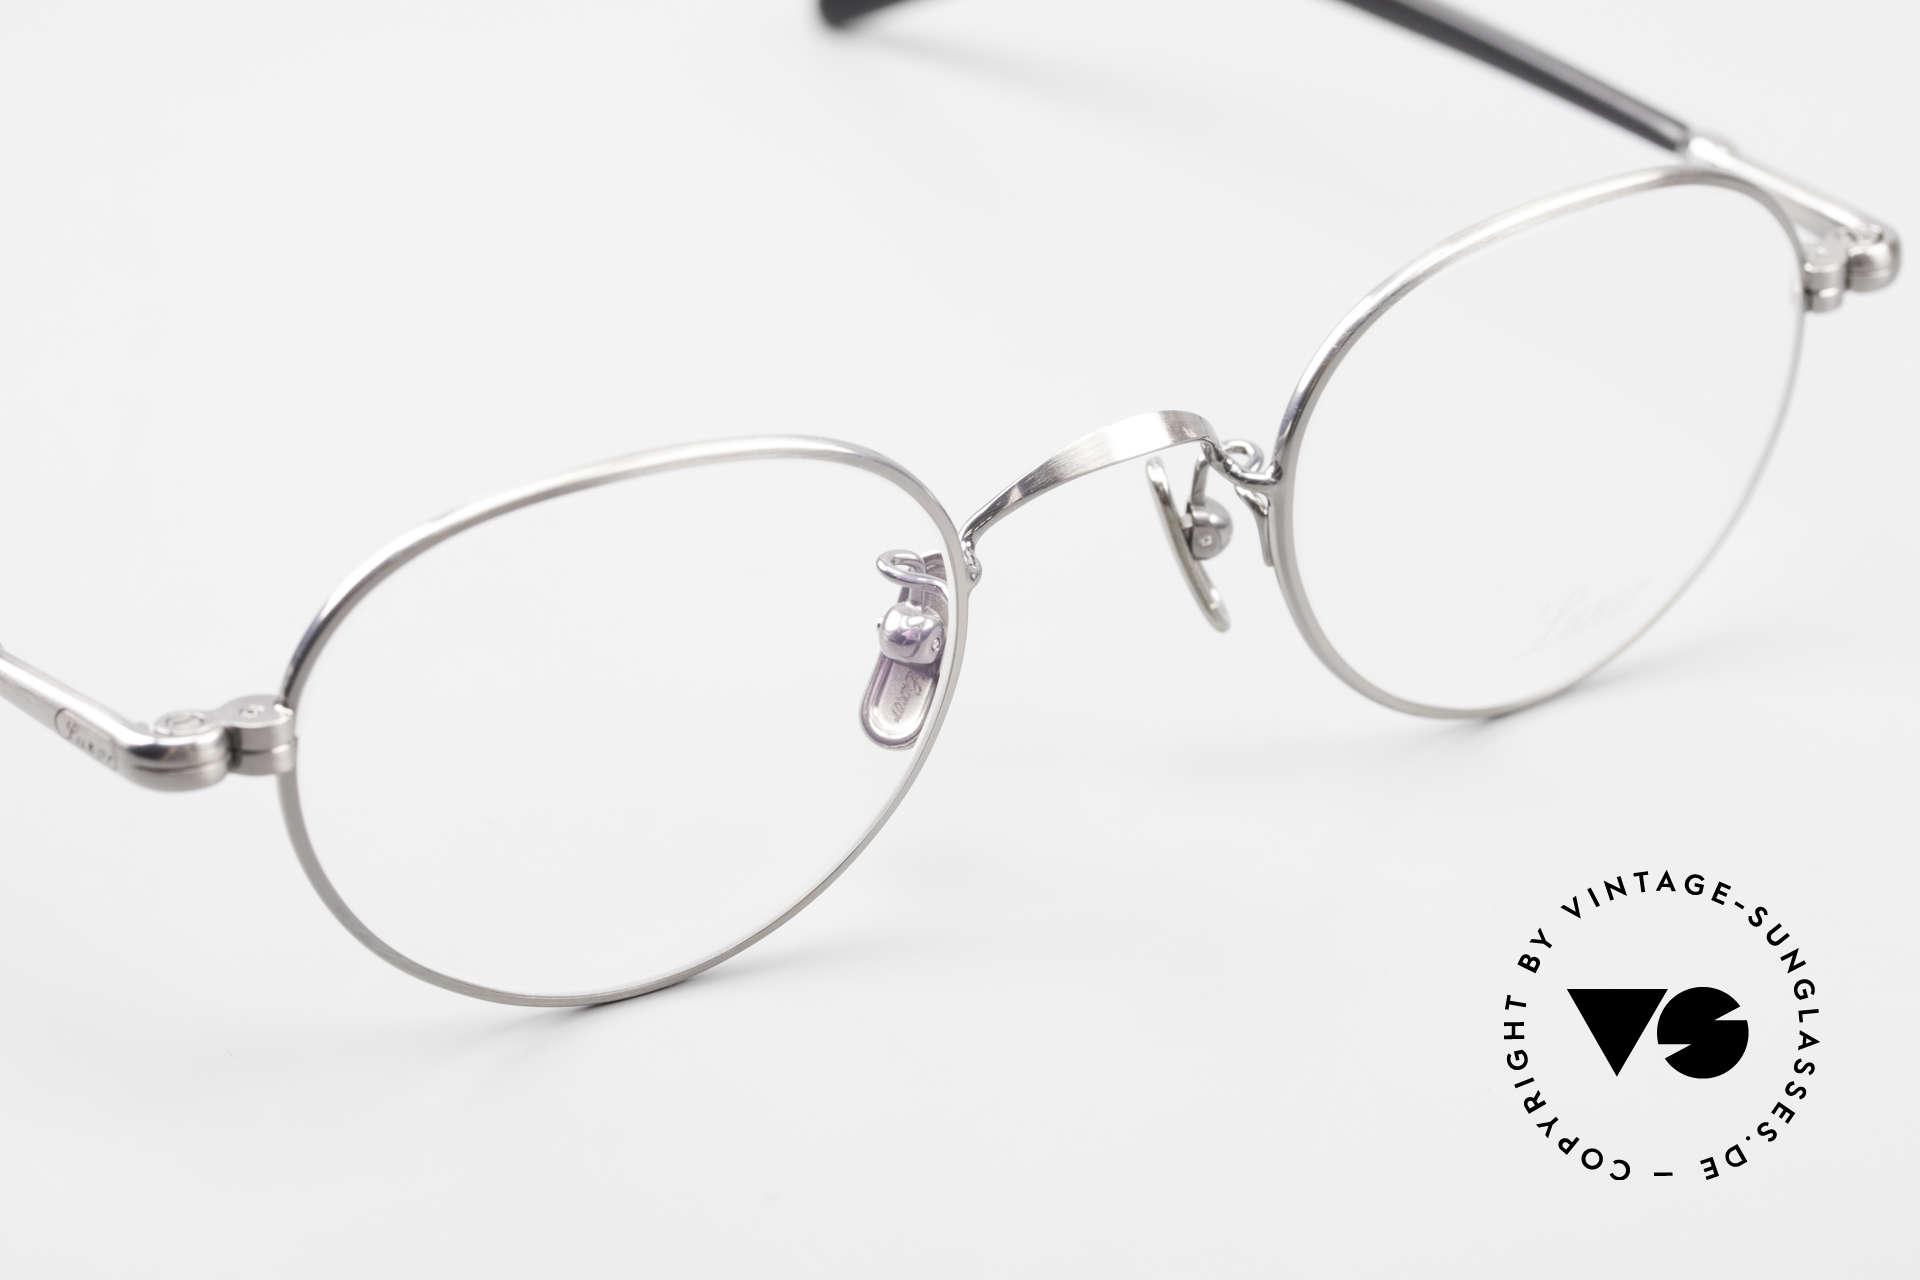 Lunor VA 107 Panto Style Antique Silver AS, top-notch craftsmanship & timeless PANTO frame design, Made for Men and Women